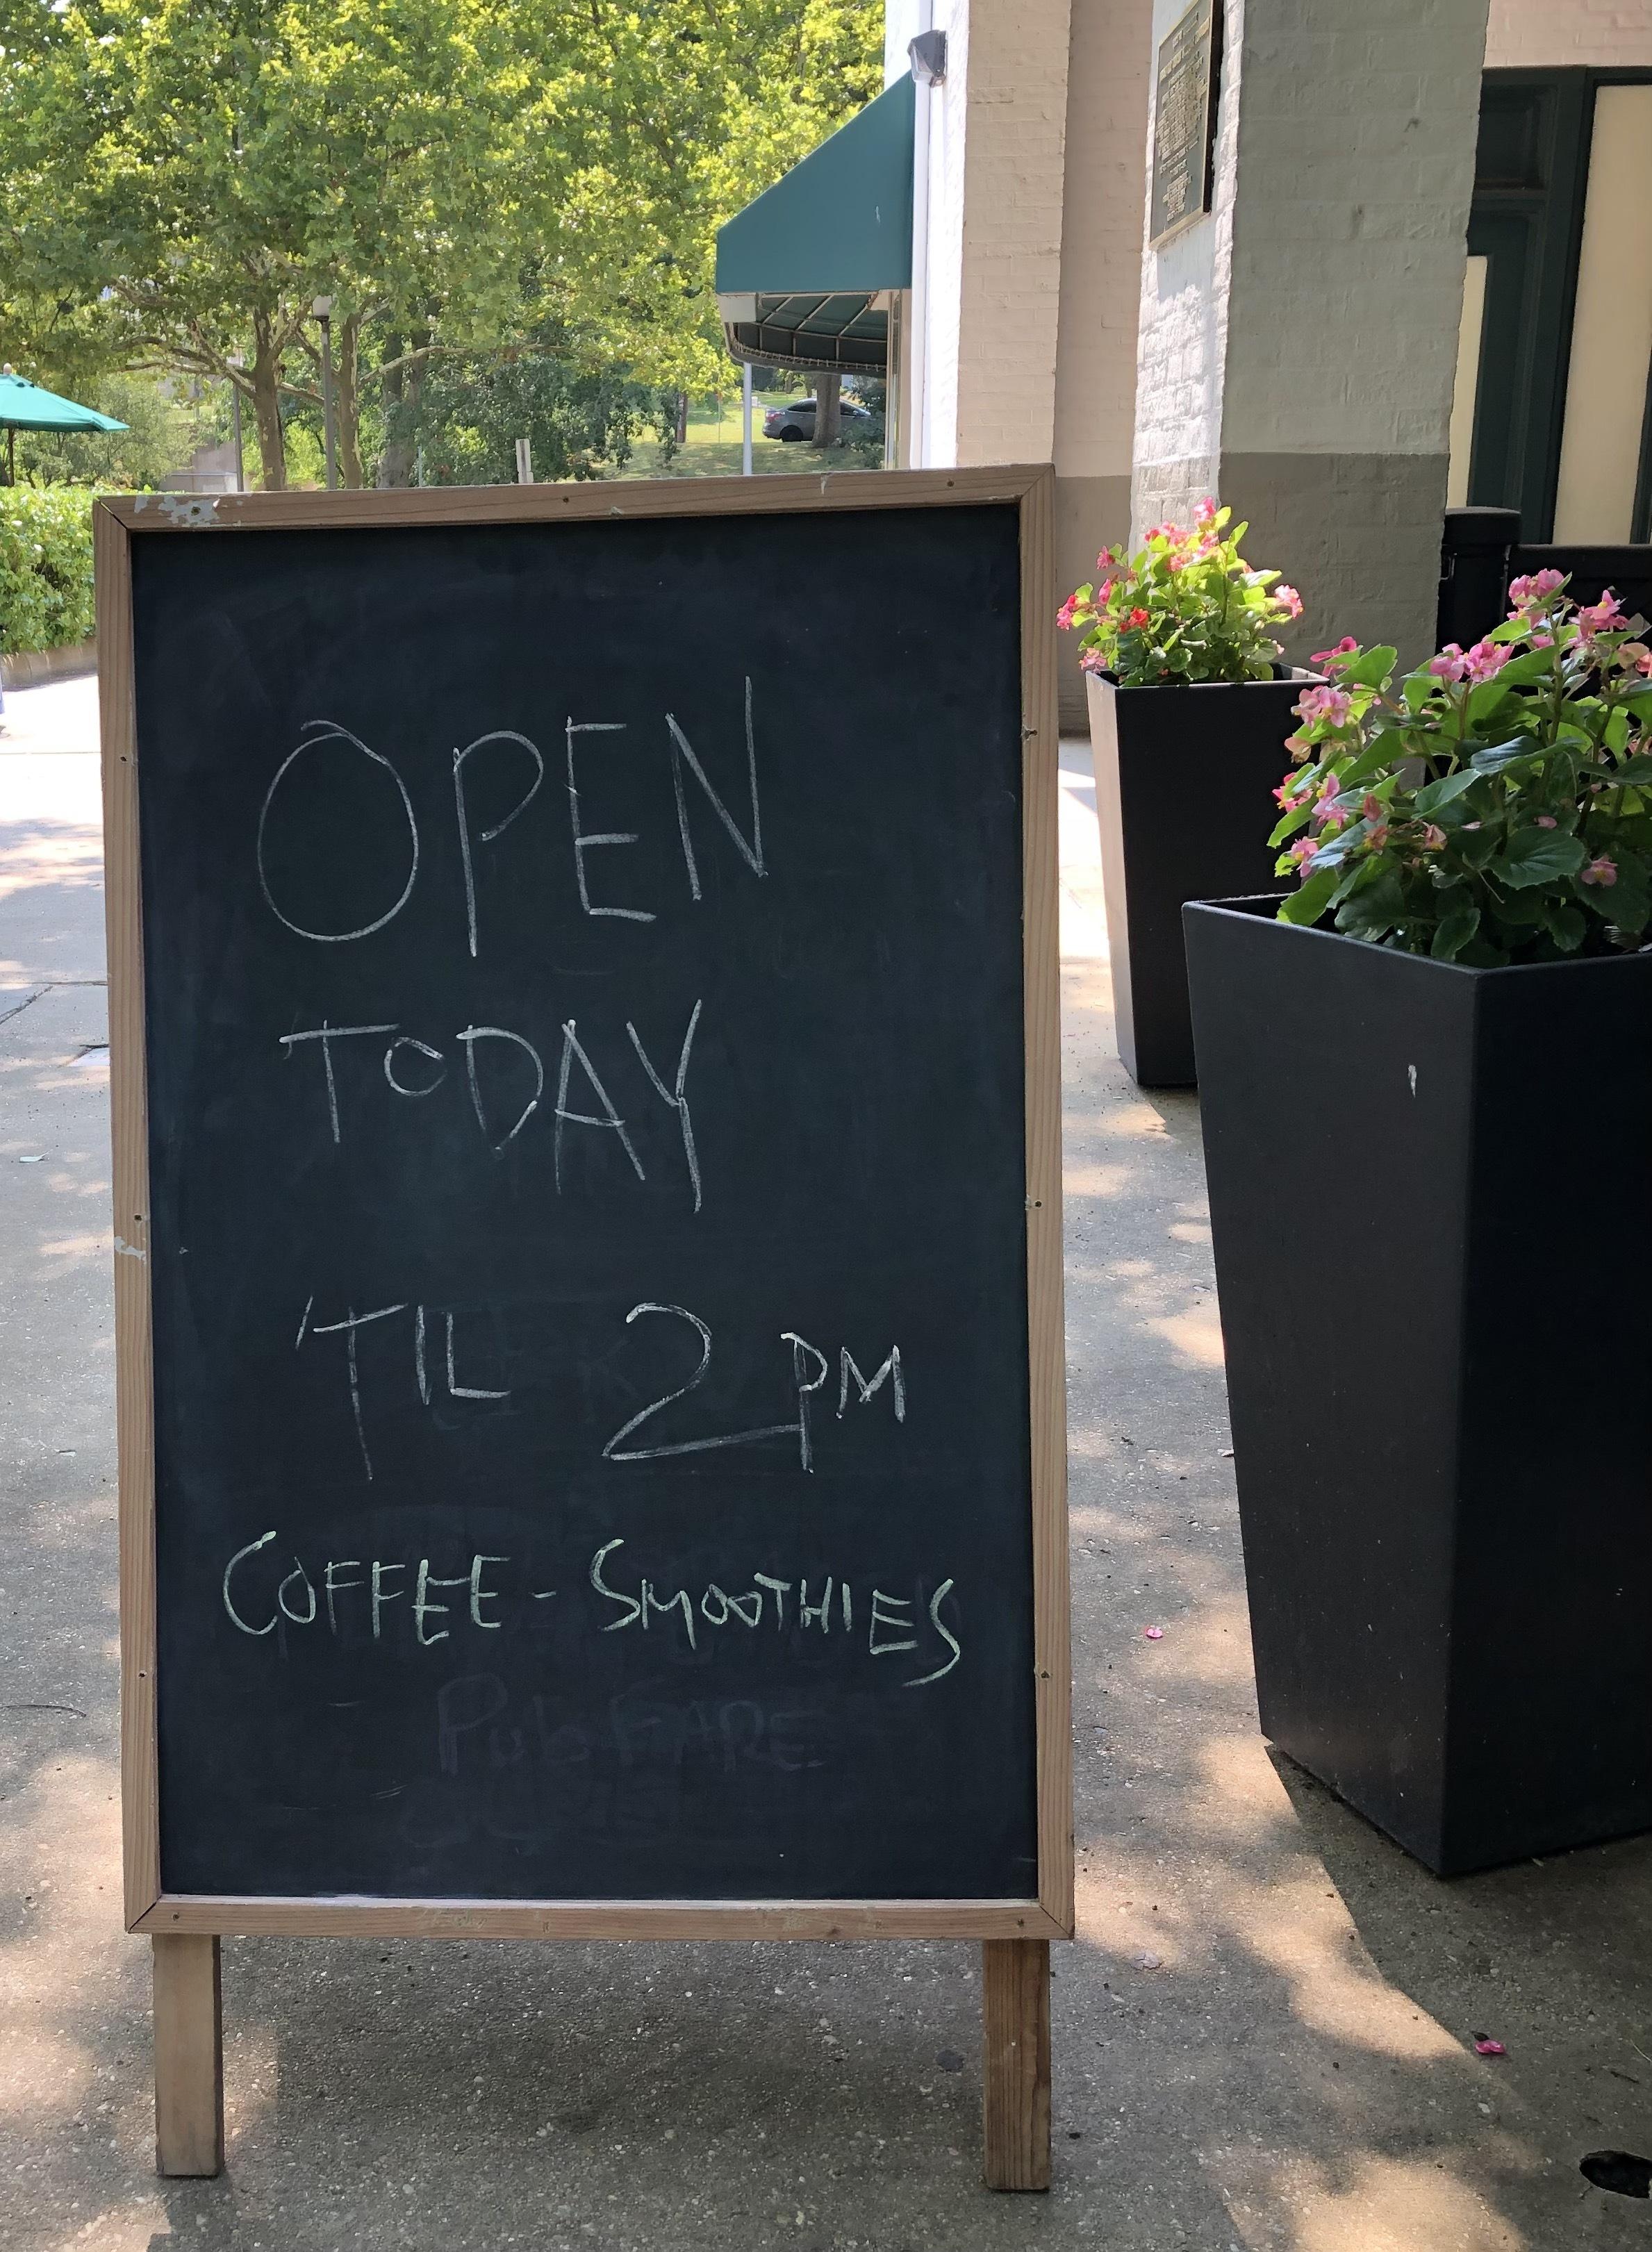 Photo: Cafe Sign.